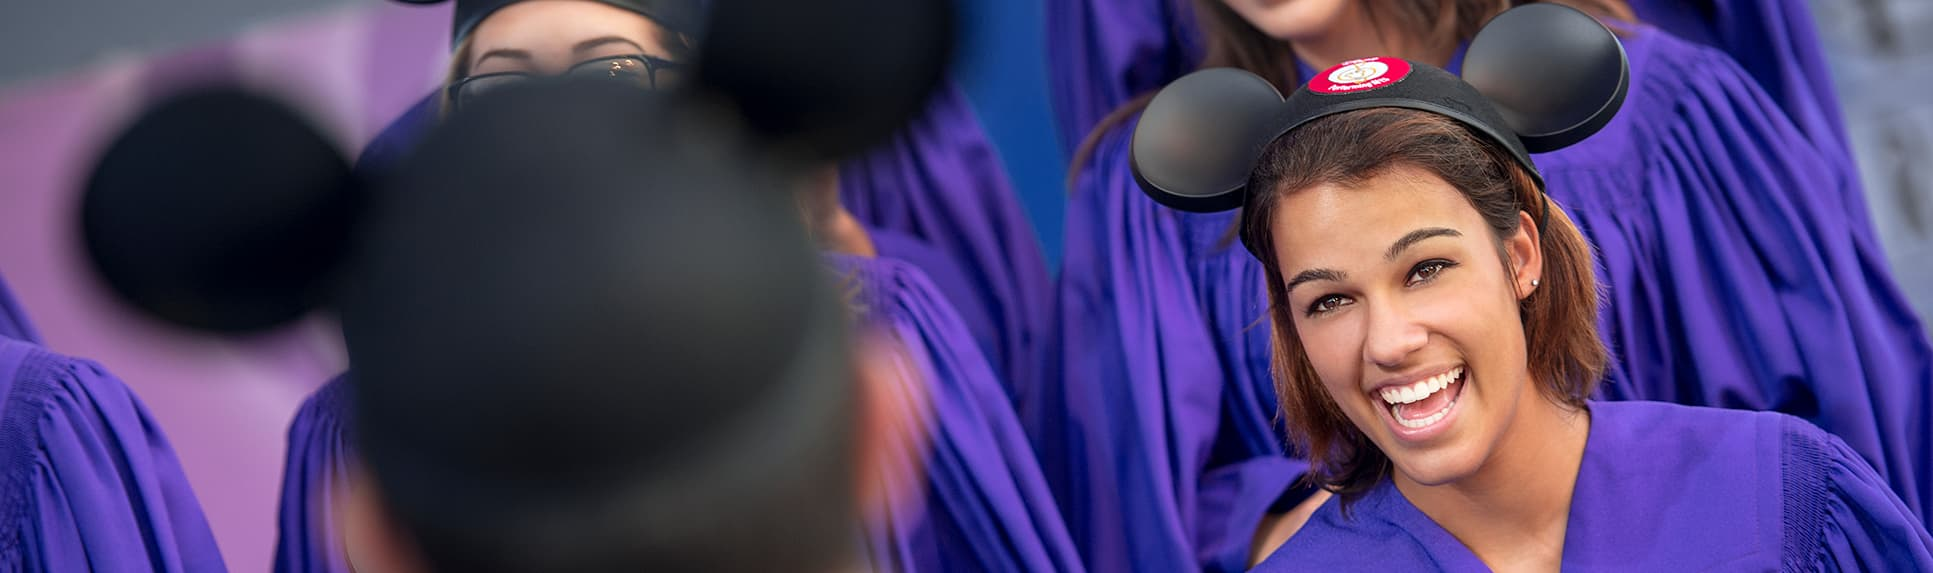 People wearing Mickey Ears sing in a choir